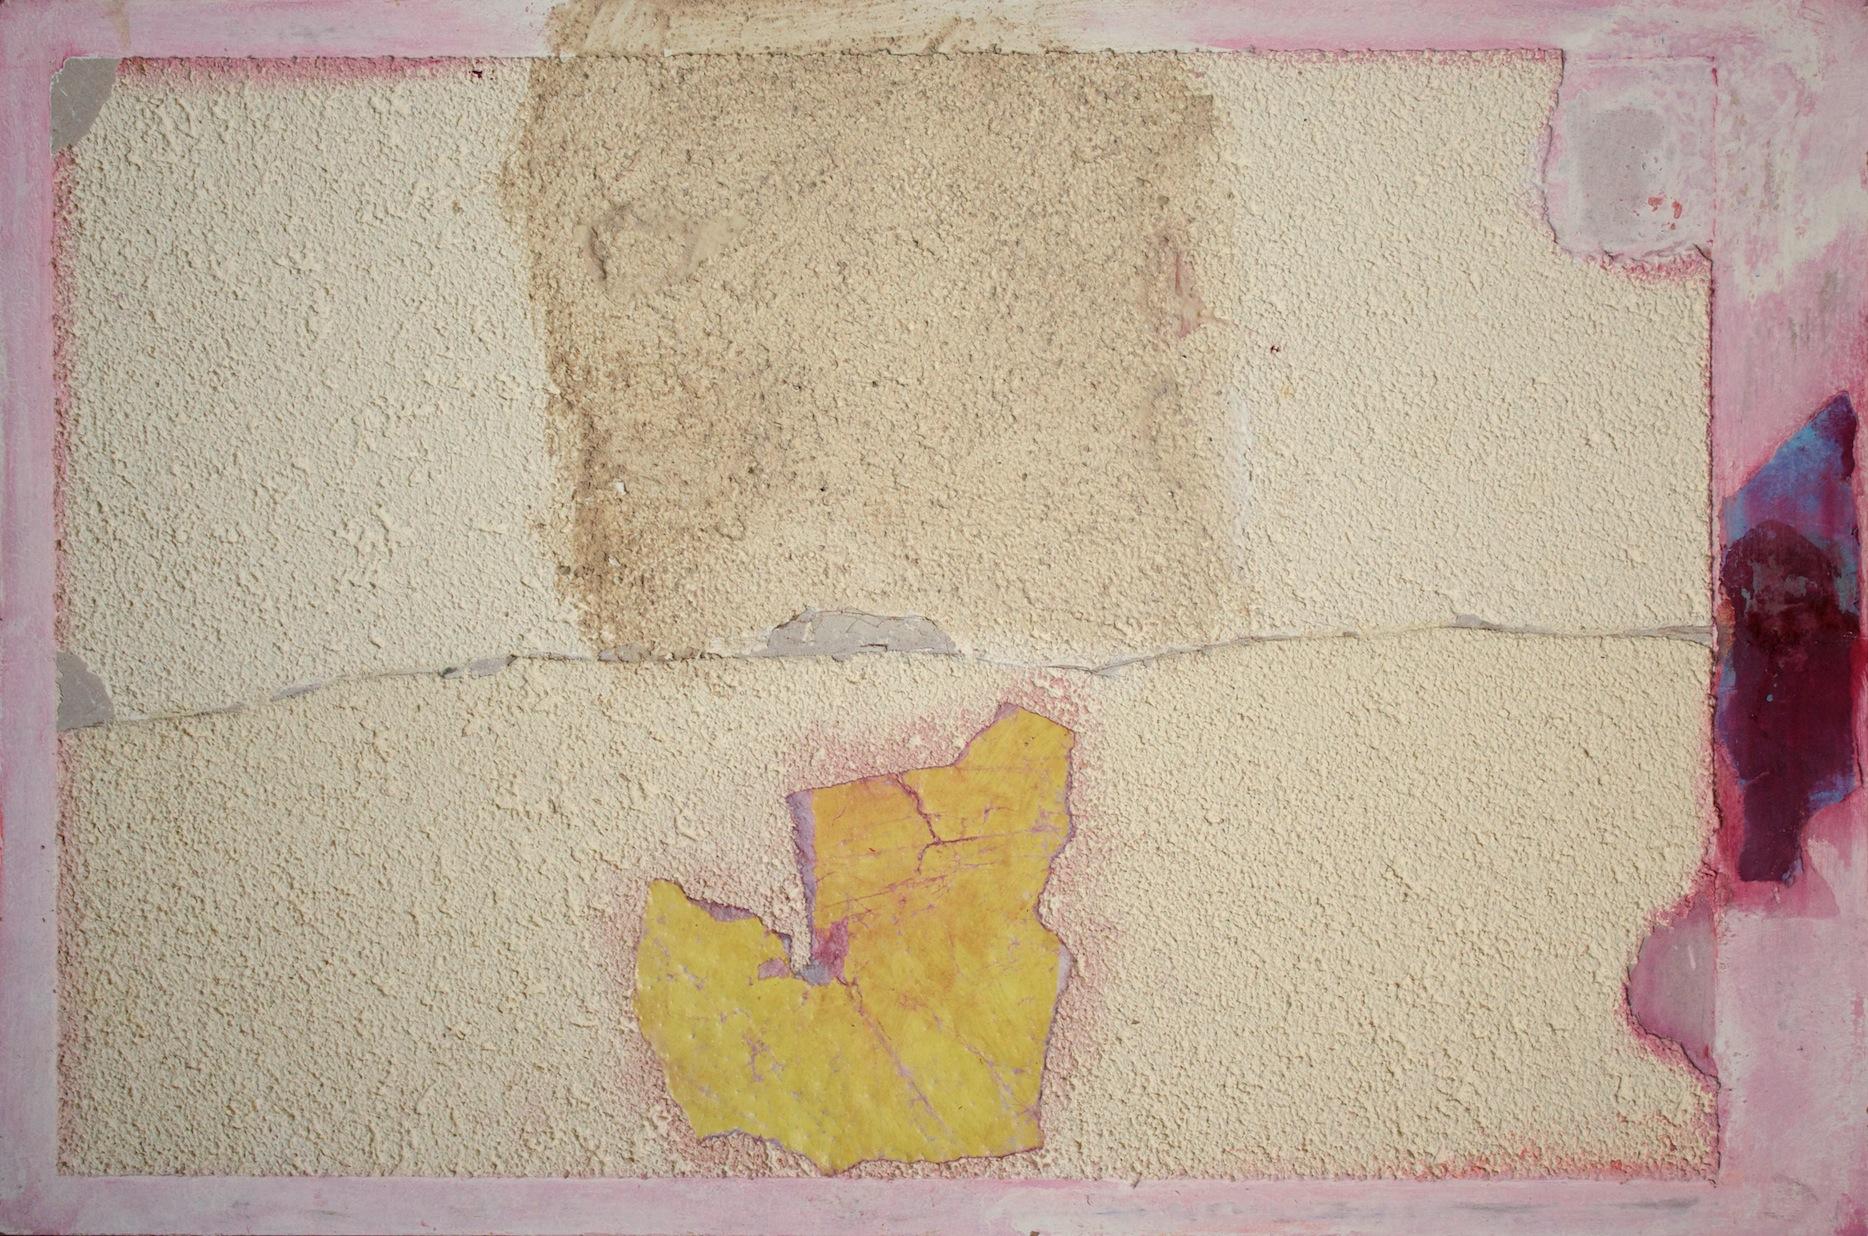 Marcello Mariani - Forma Archetipa - Plaster powder and mixed media on masonite - 2009